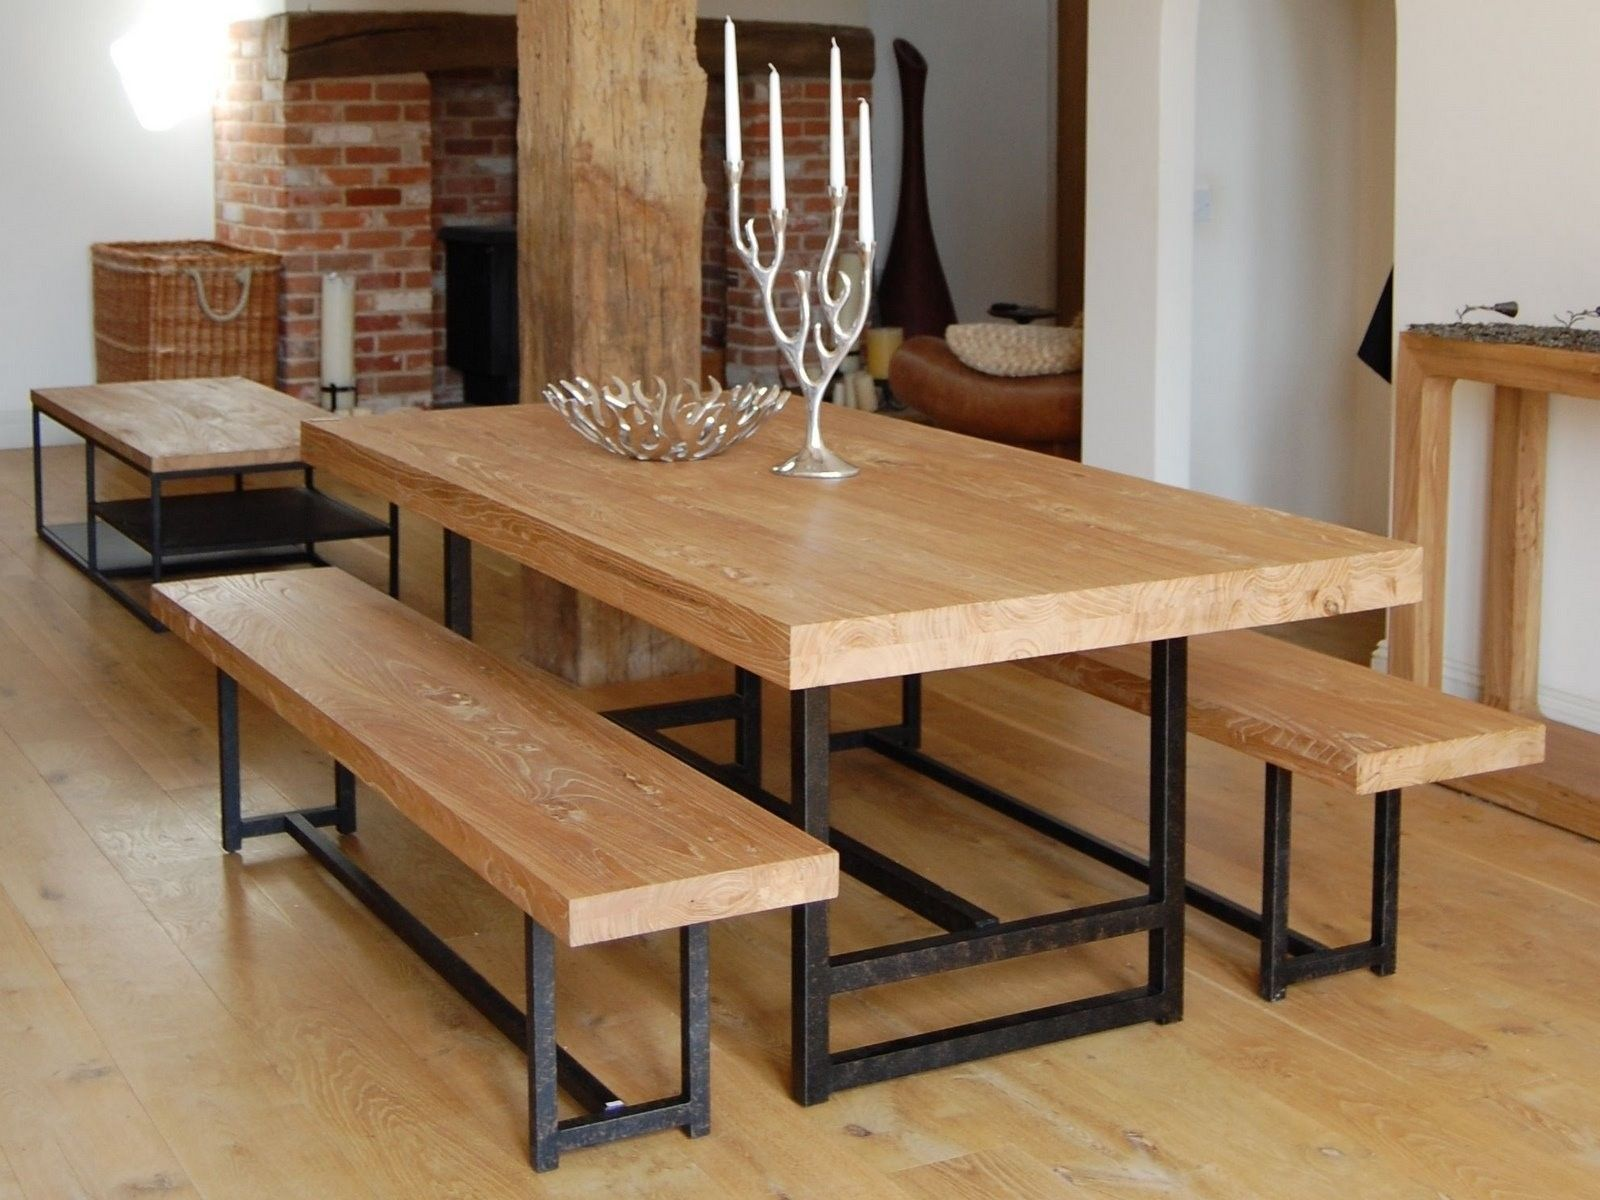 Minimalist Rustic Dining Room Table Black Matte Anodized Steel